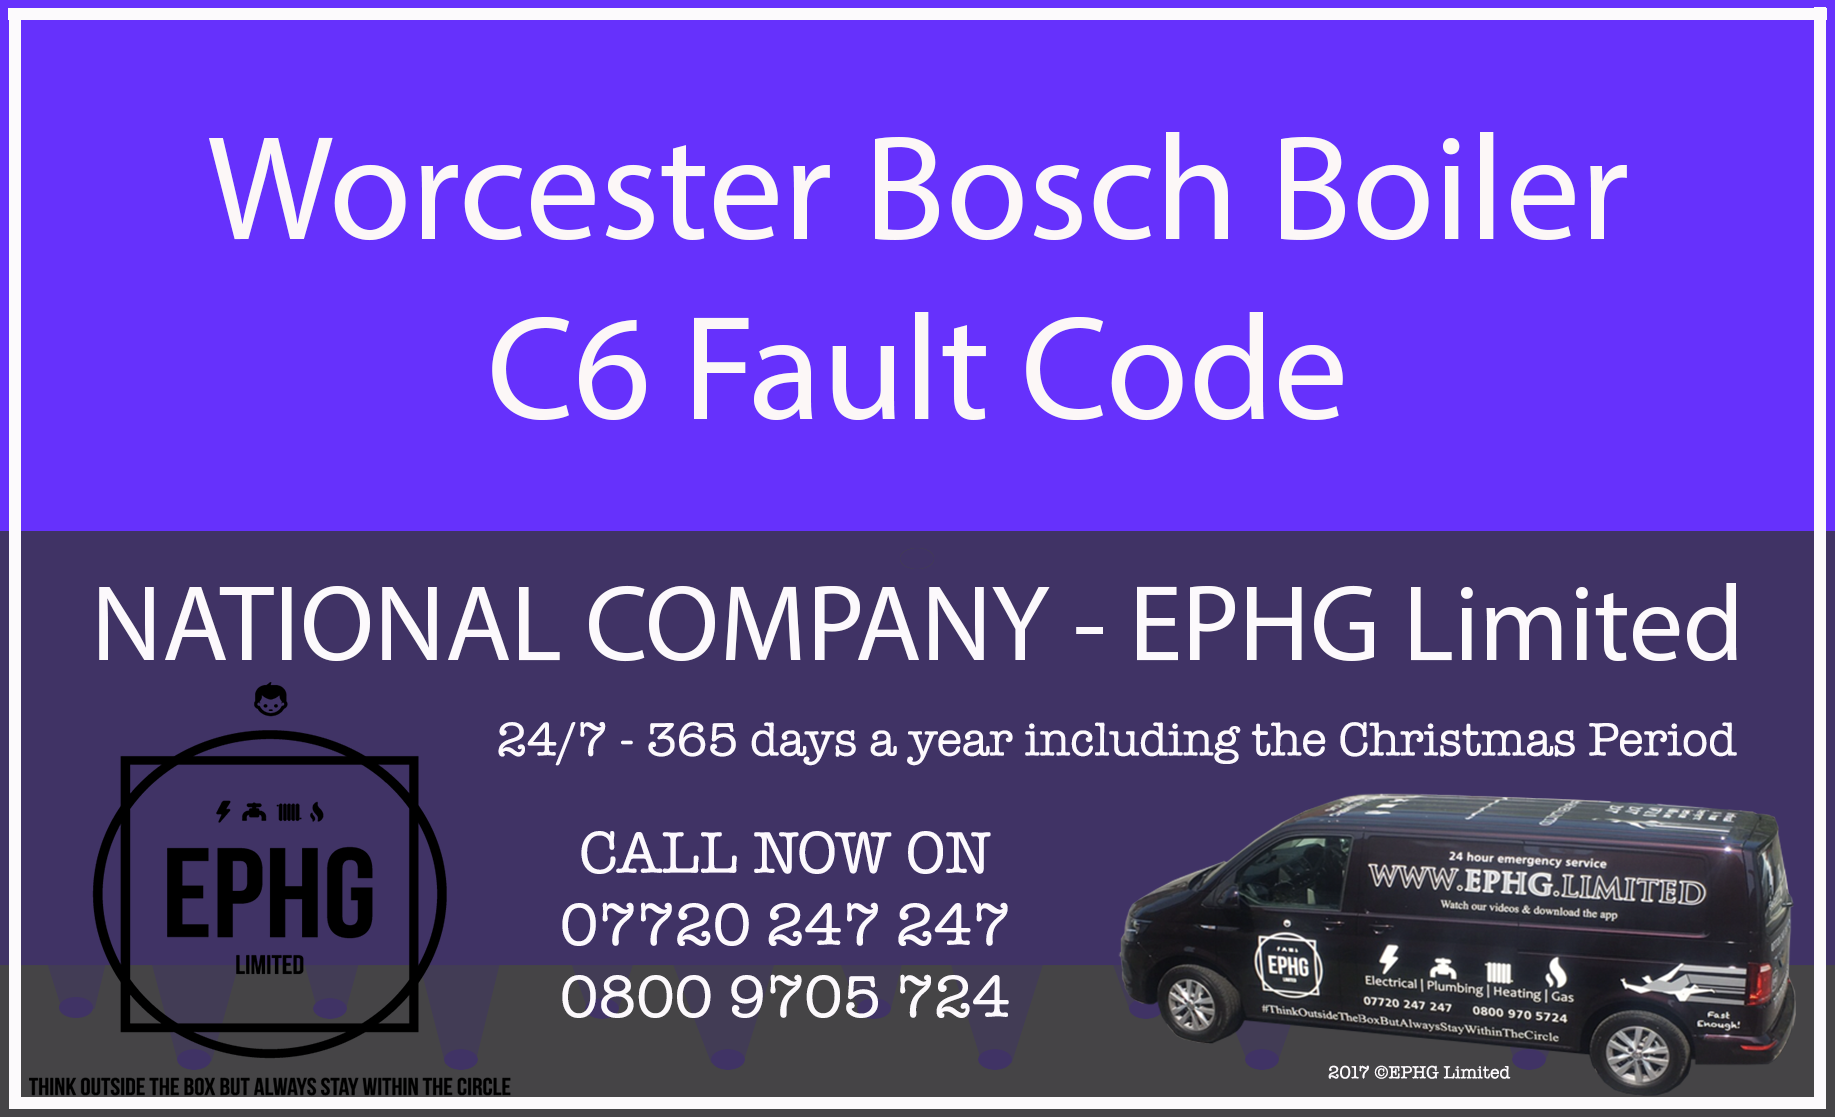 Worcester Bosch Boiler C6 Fault Code